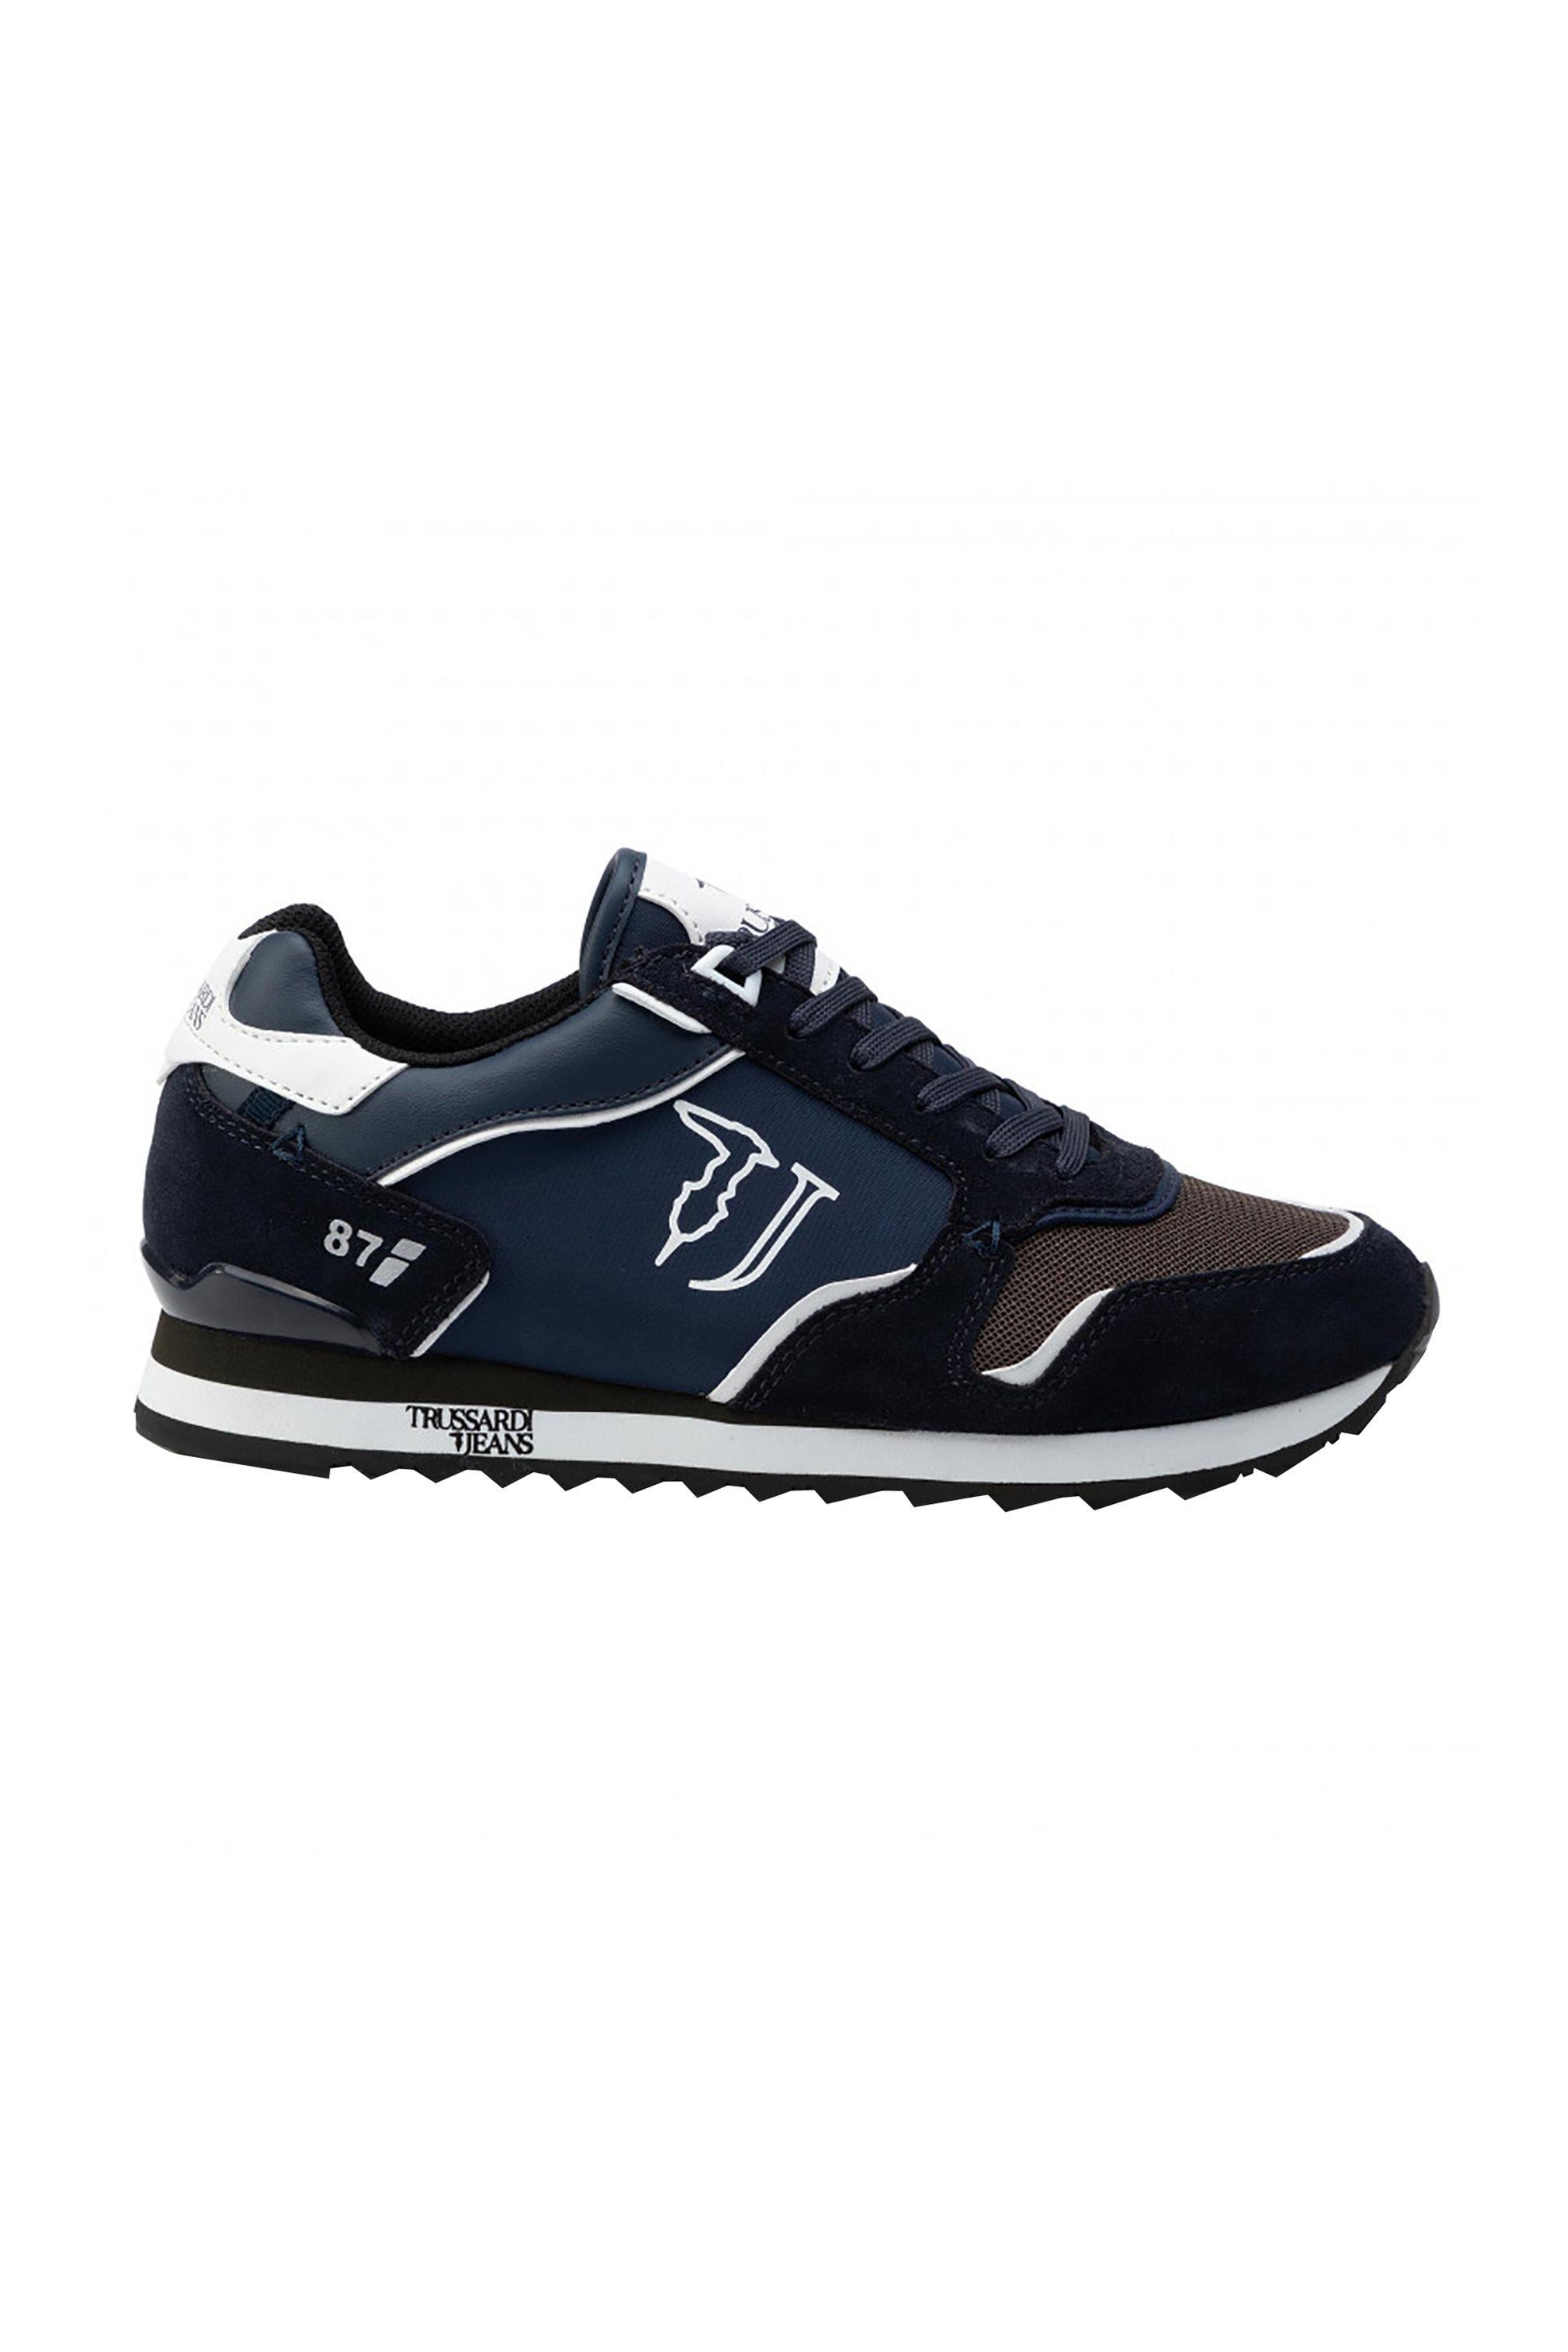 Trussardi Jeans ανδρικά sneakers με suede λεπτομέρειες και logo print – 77A00188-9Y099999 – Μπλε Σκούρο